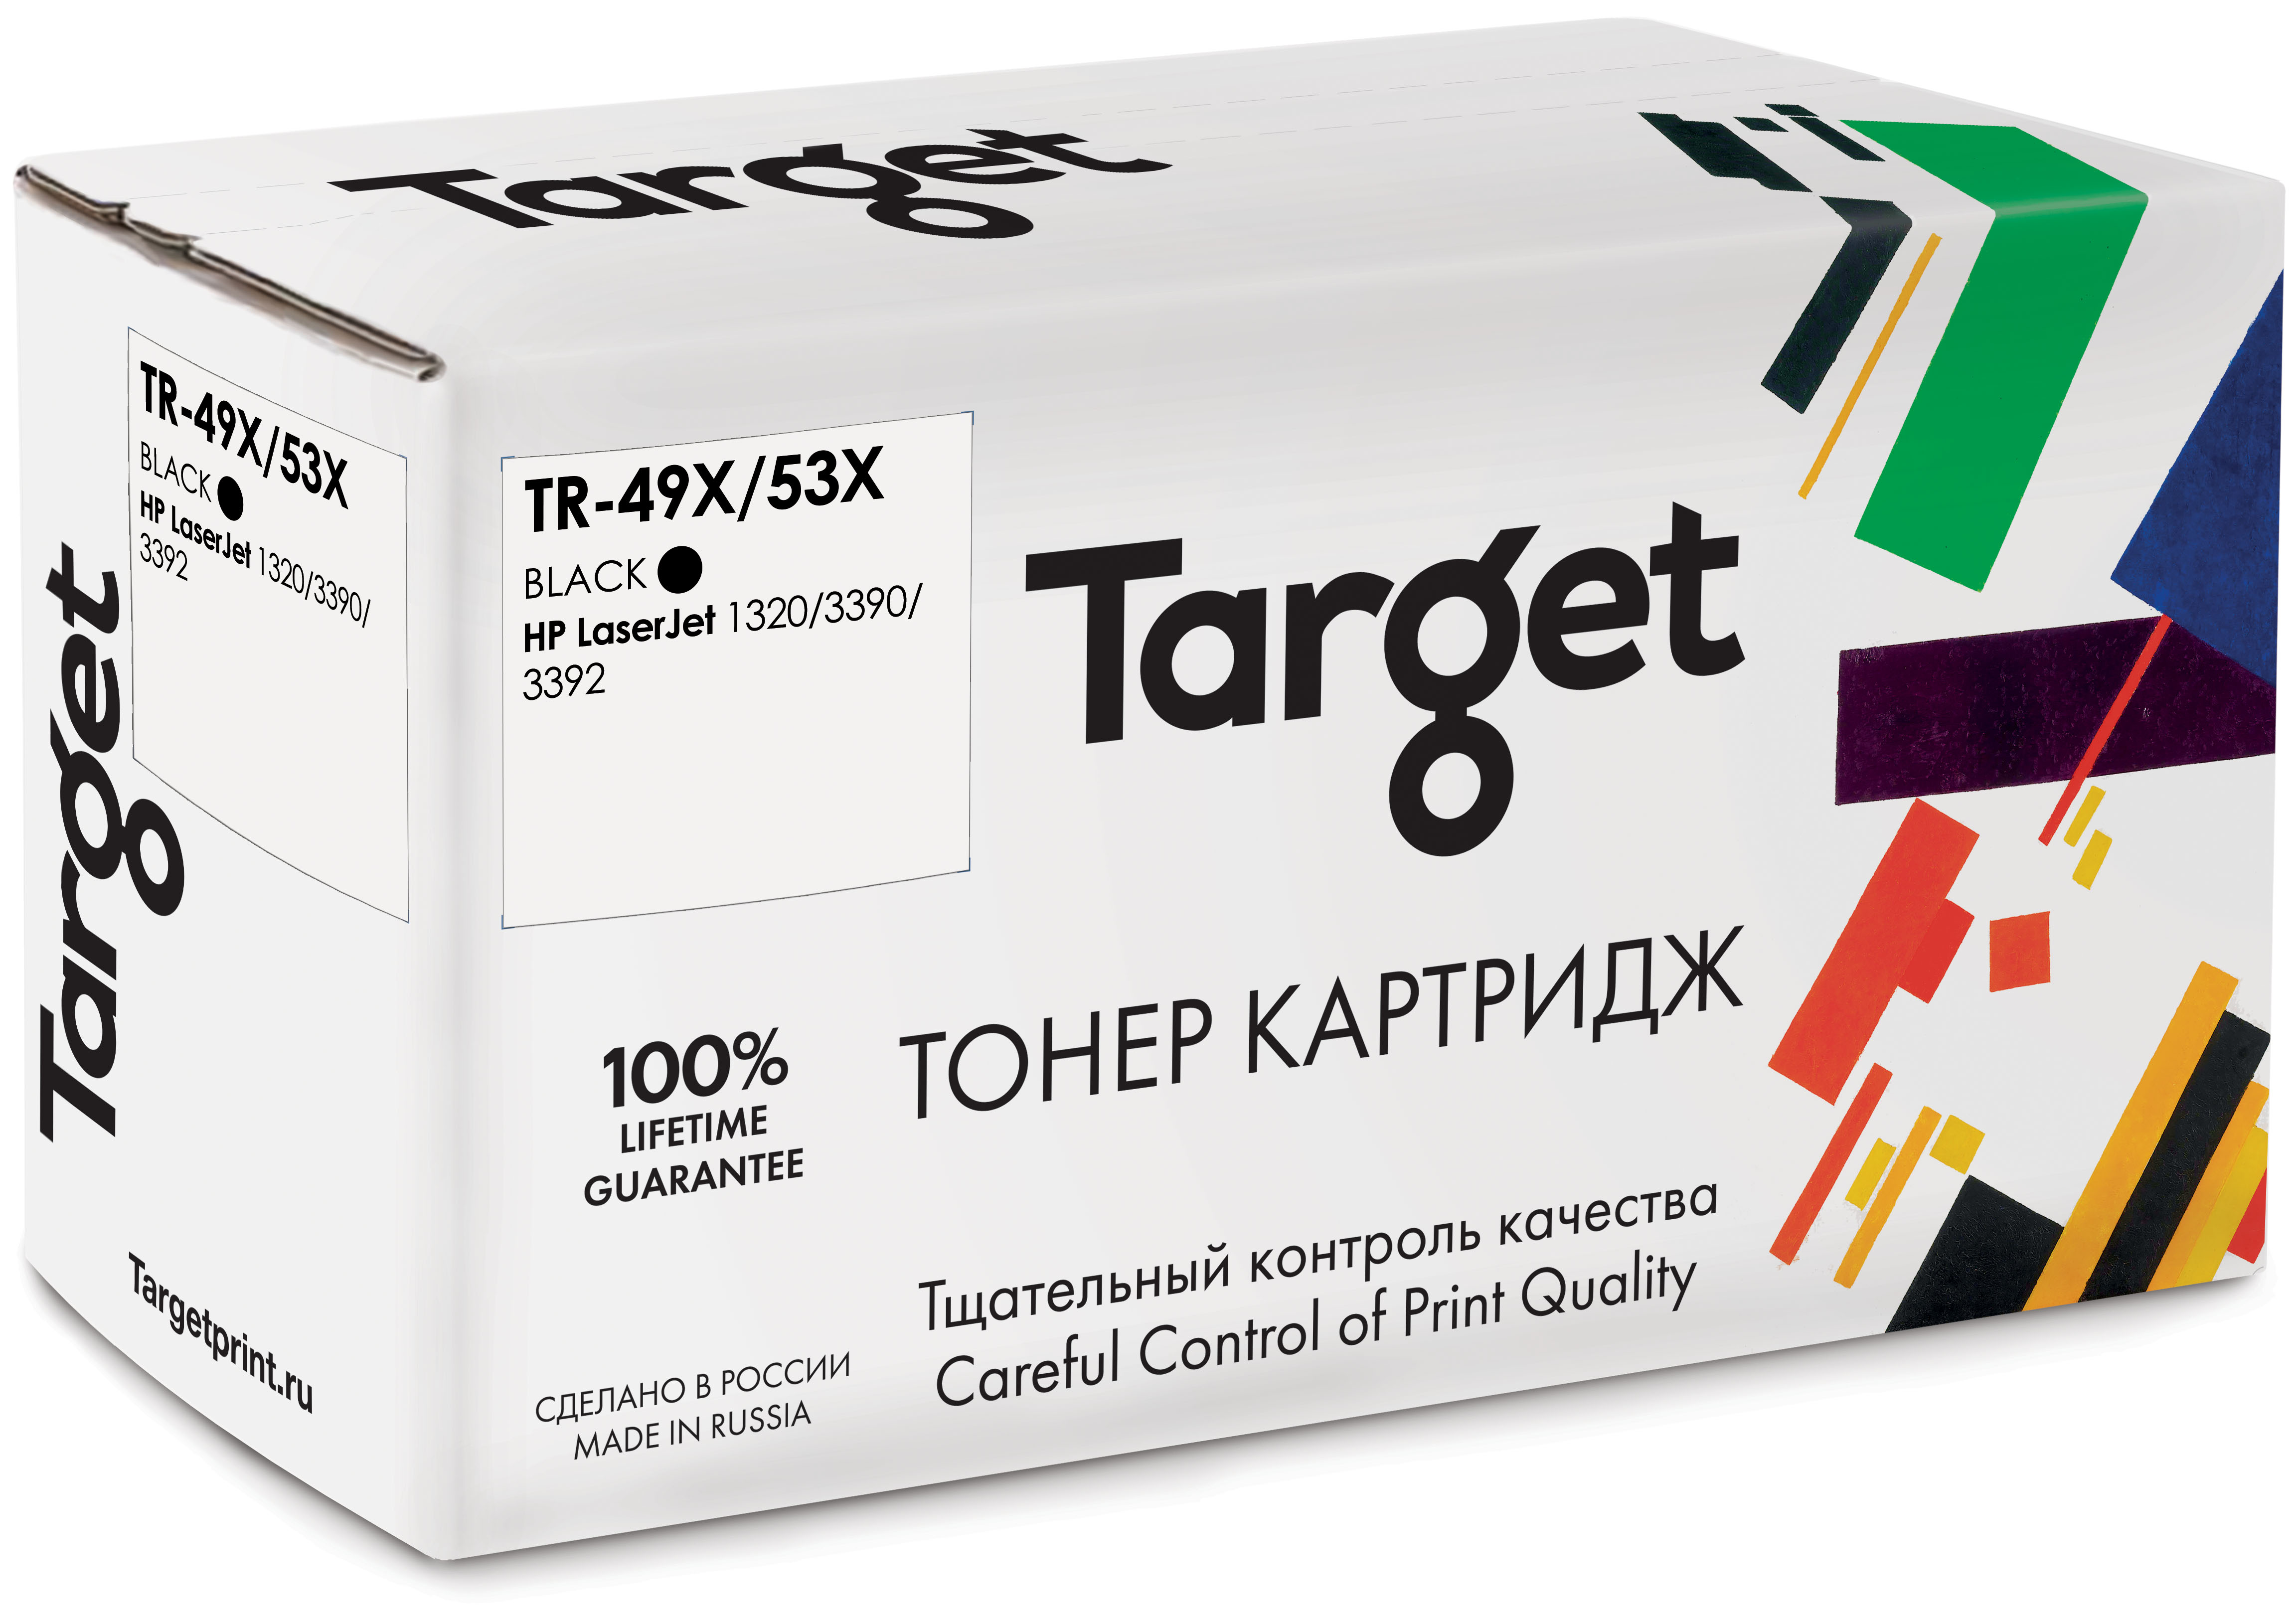 HP 49X/53X картридж Target